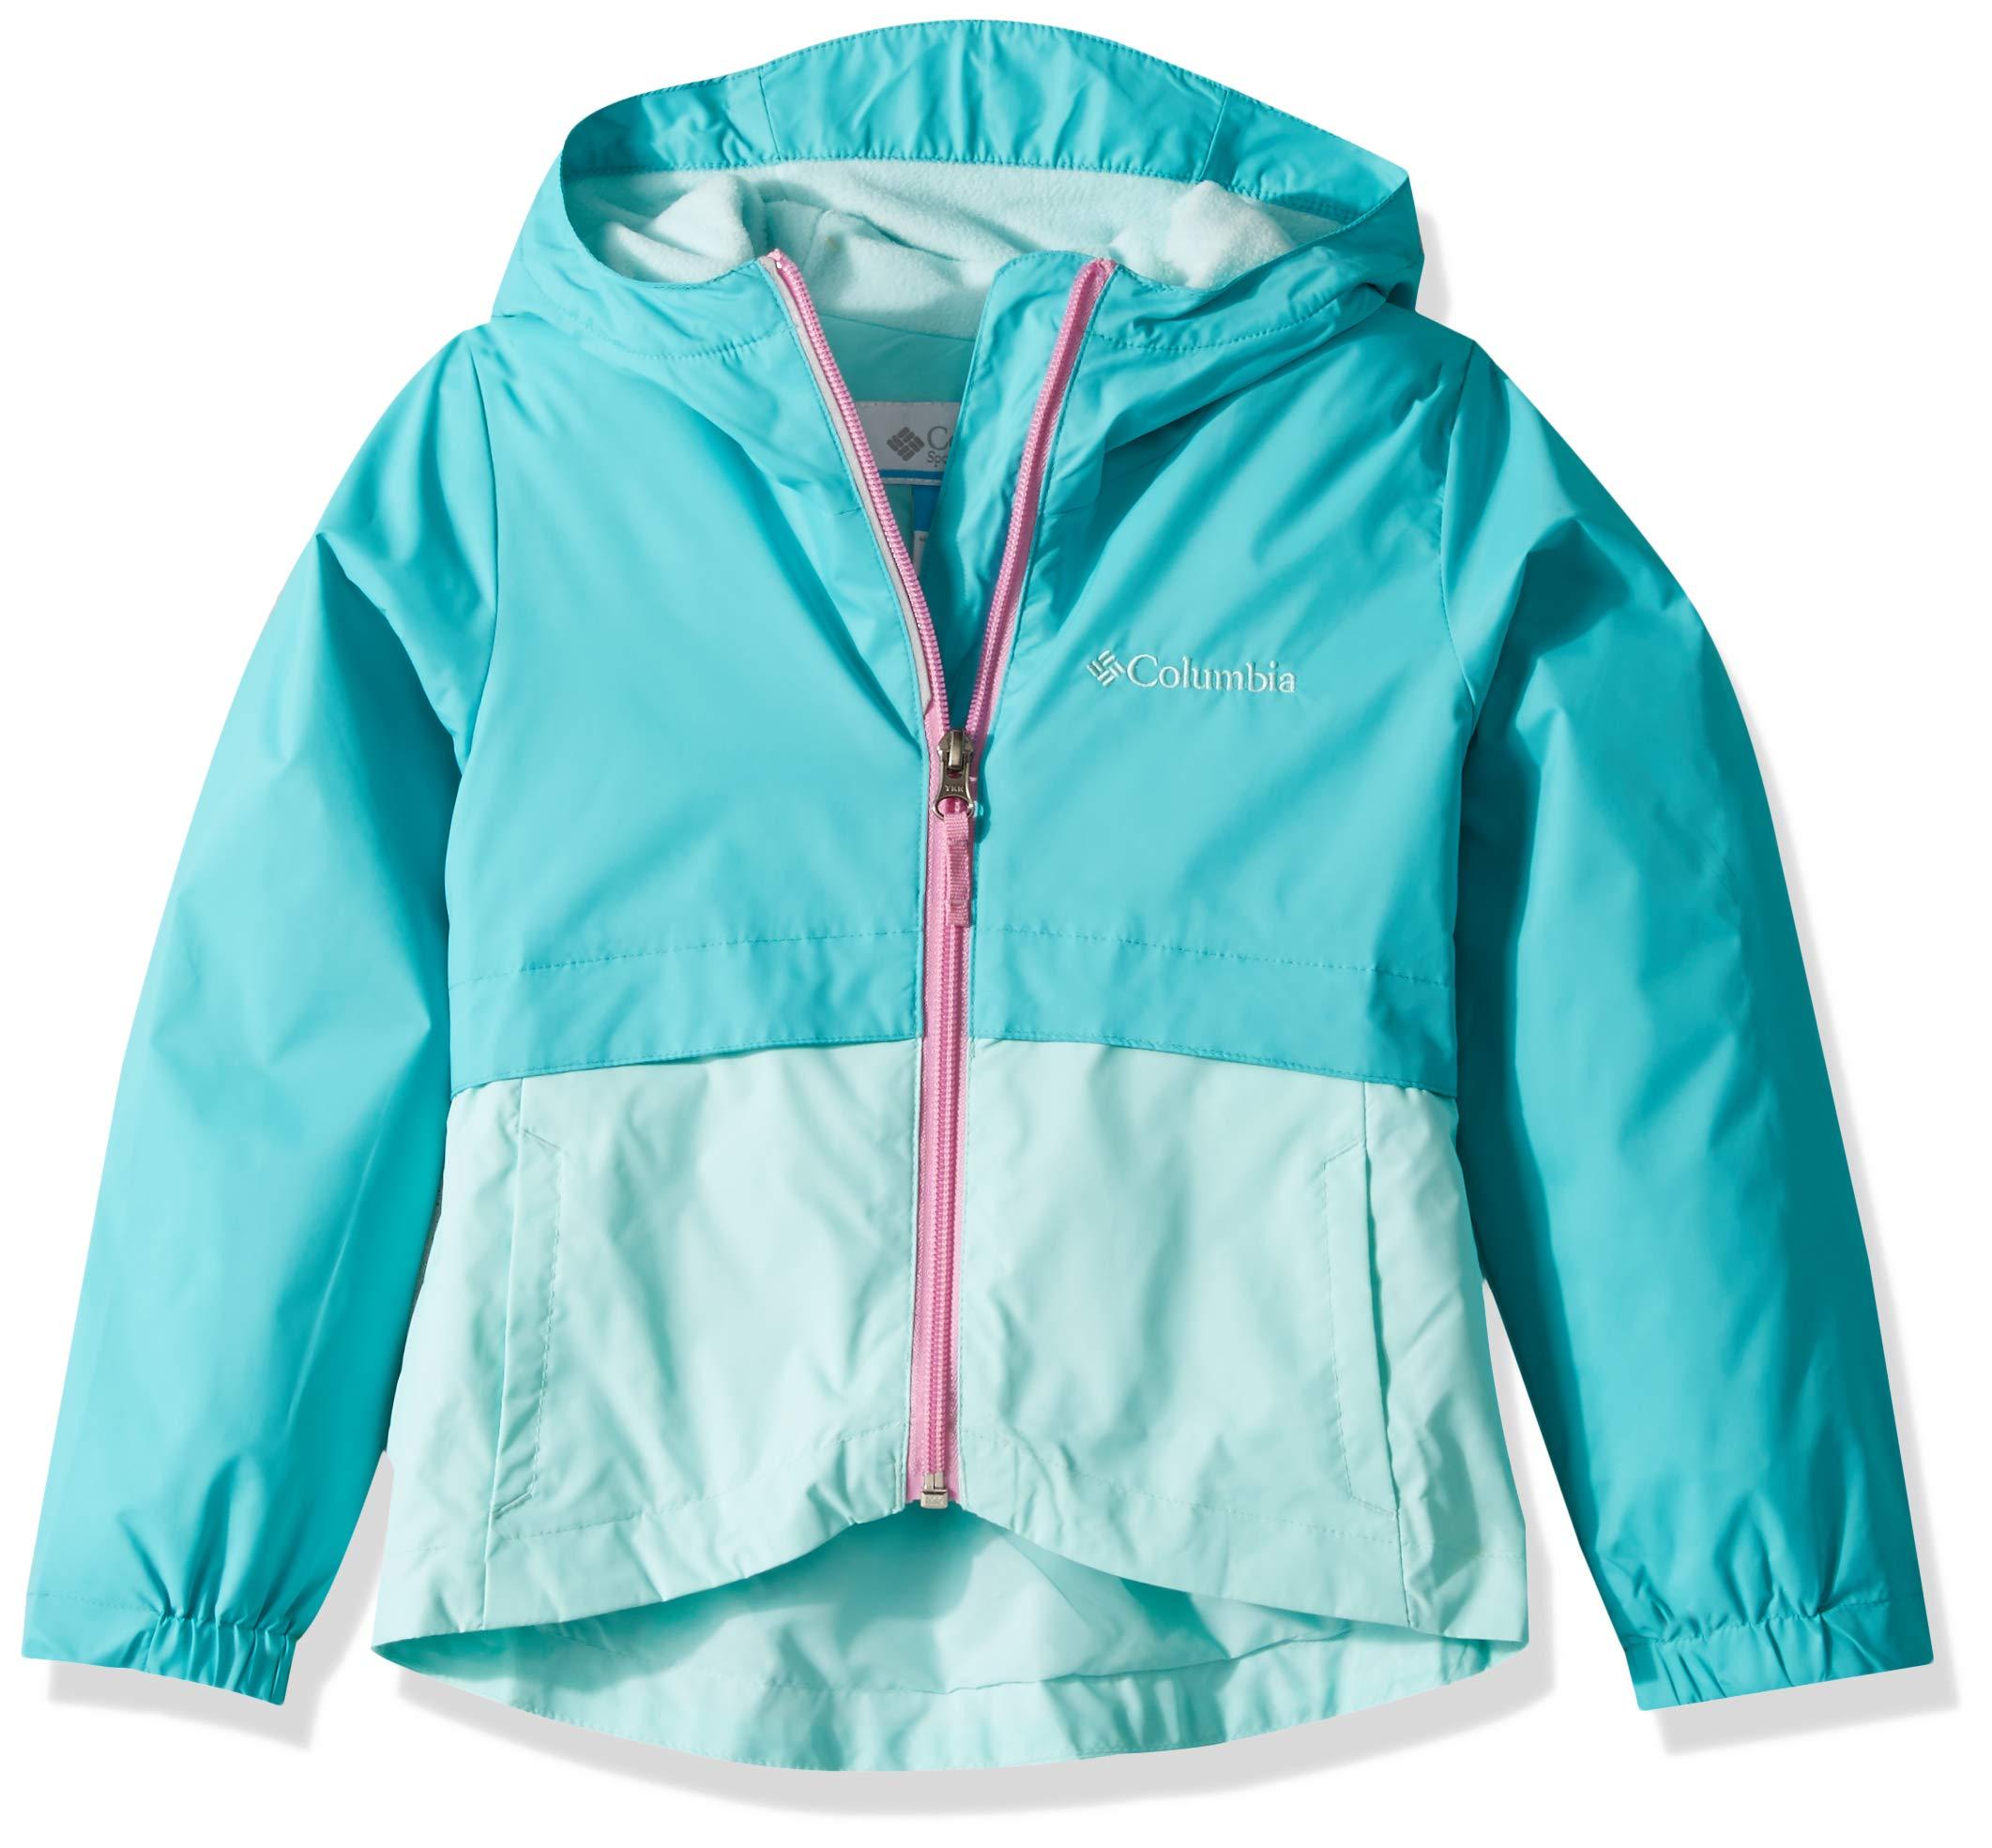 Columbia Girls' Big Rain-Zilla Jacket, Geyser/Gulf Stream, Large